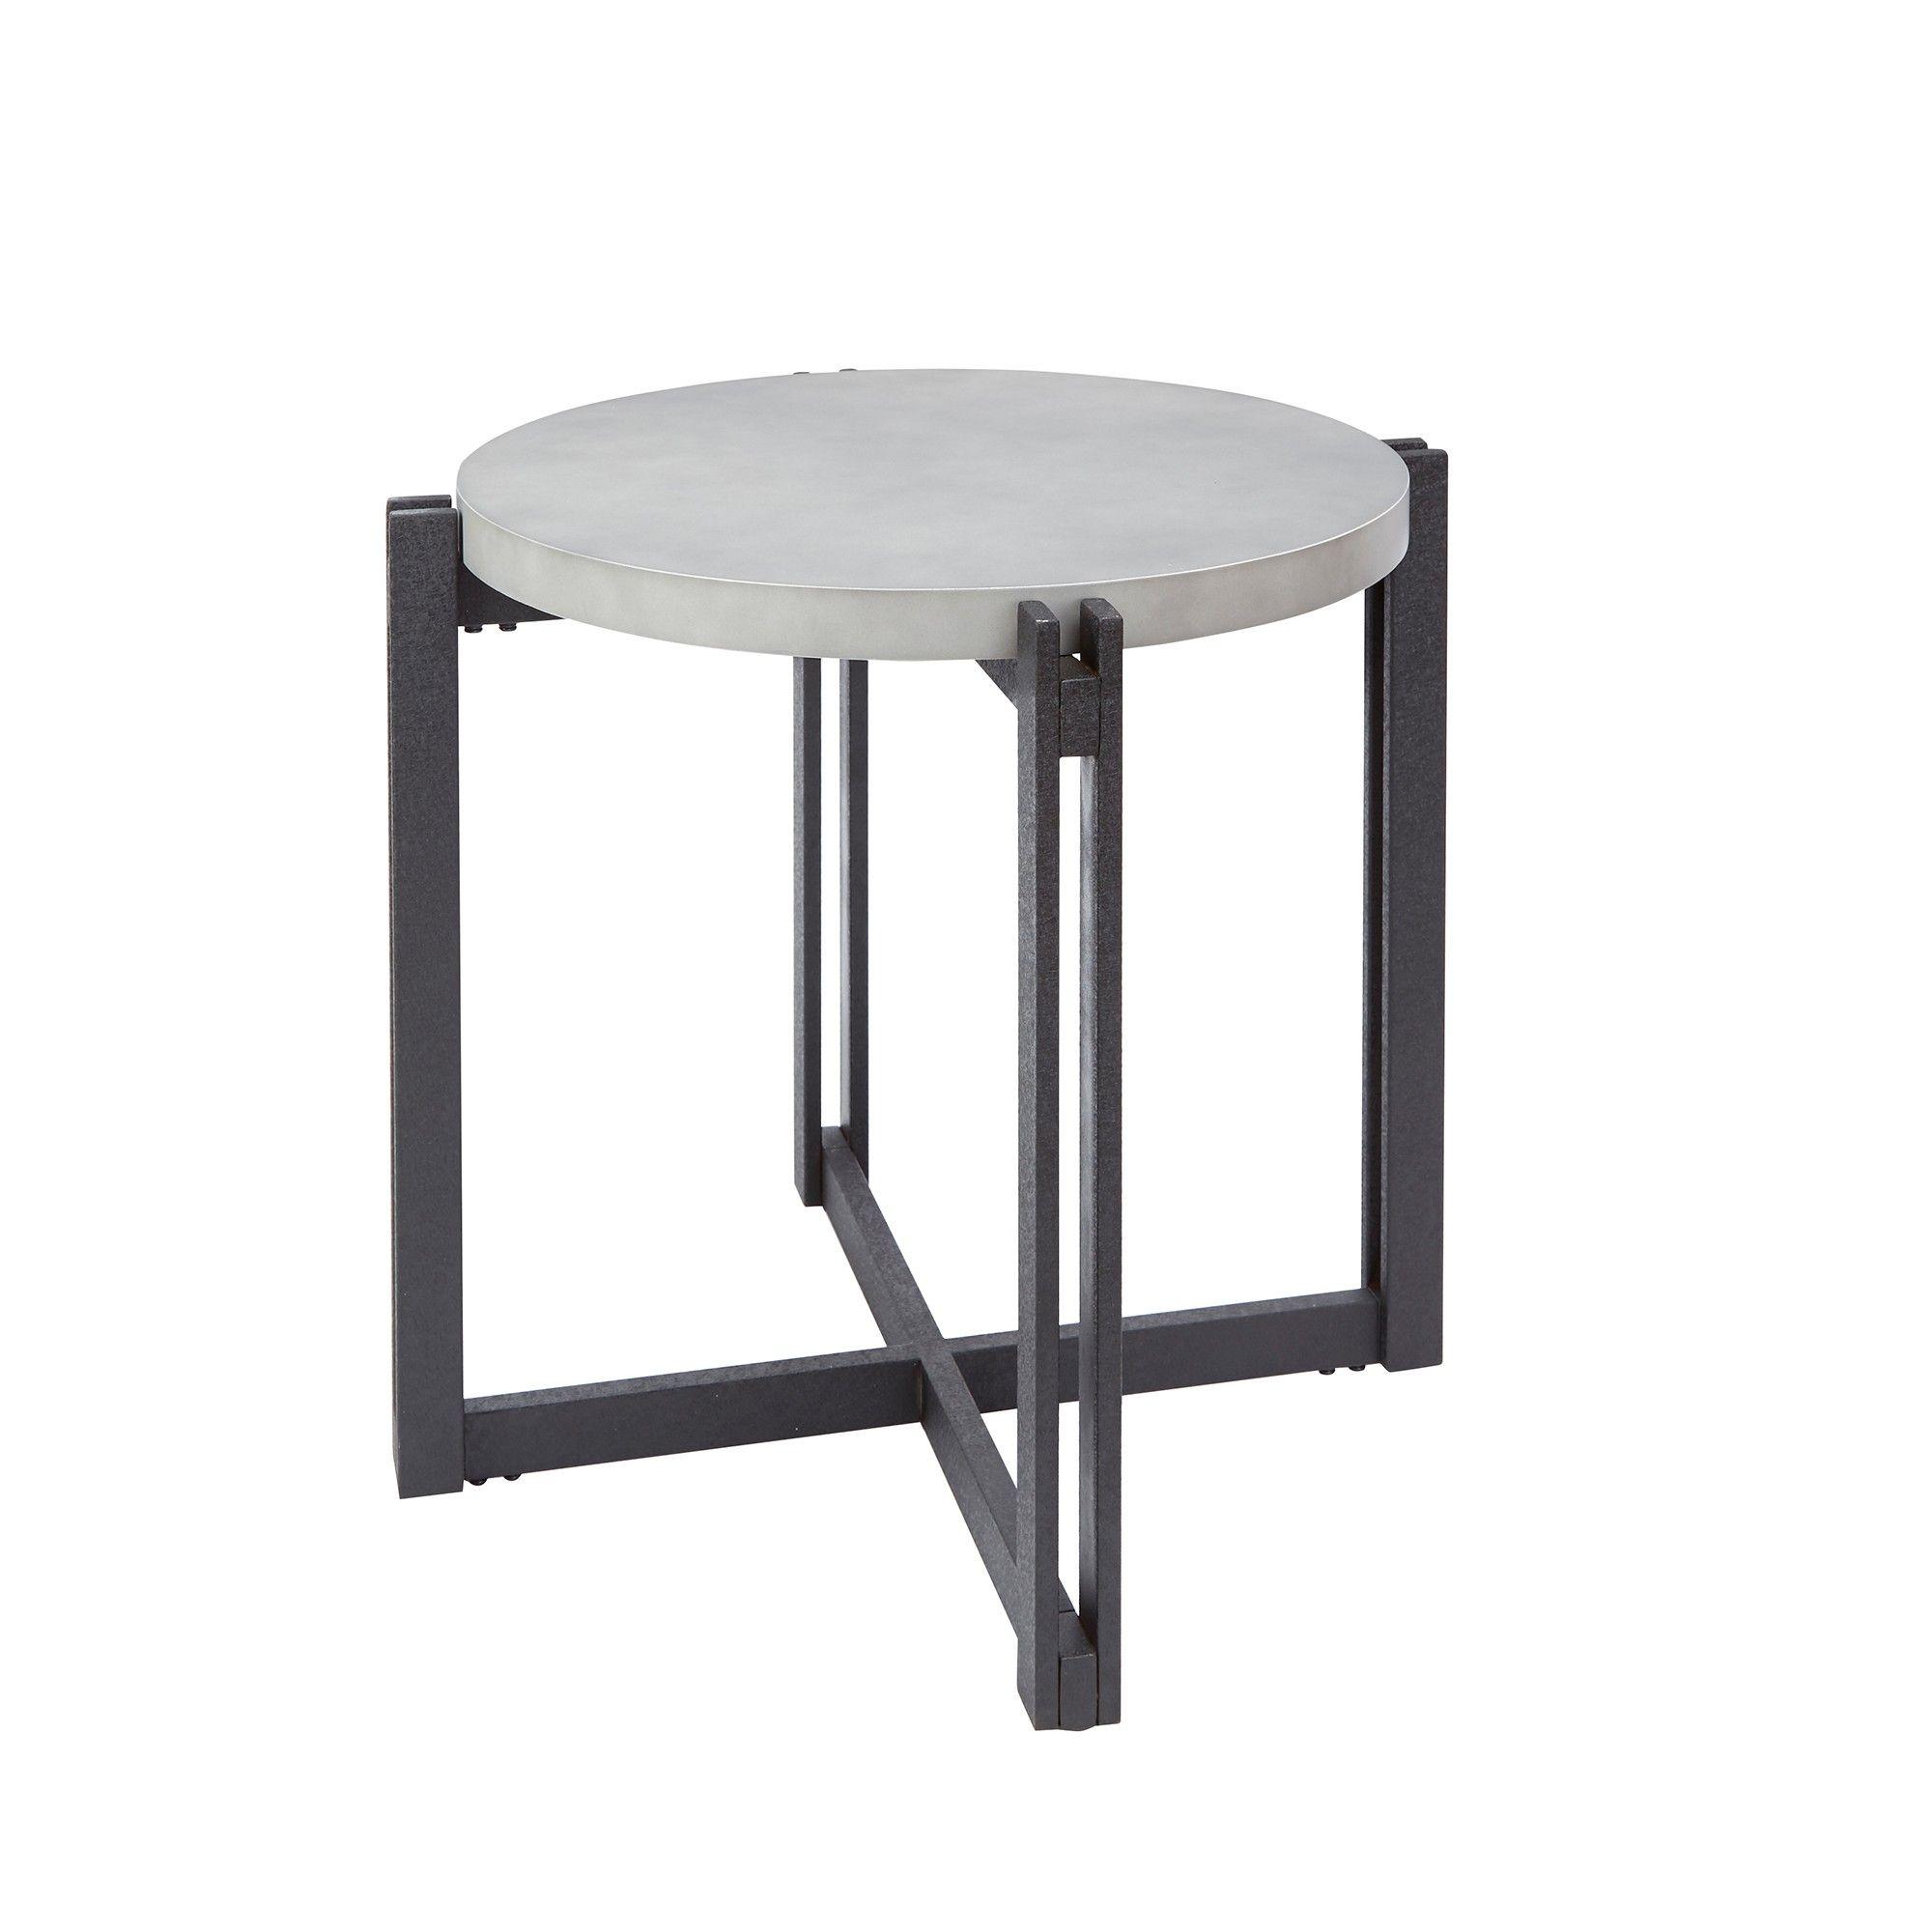 Silverwood Dakota End Table With Round Concrete Fish Top Gray